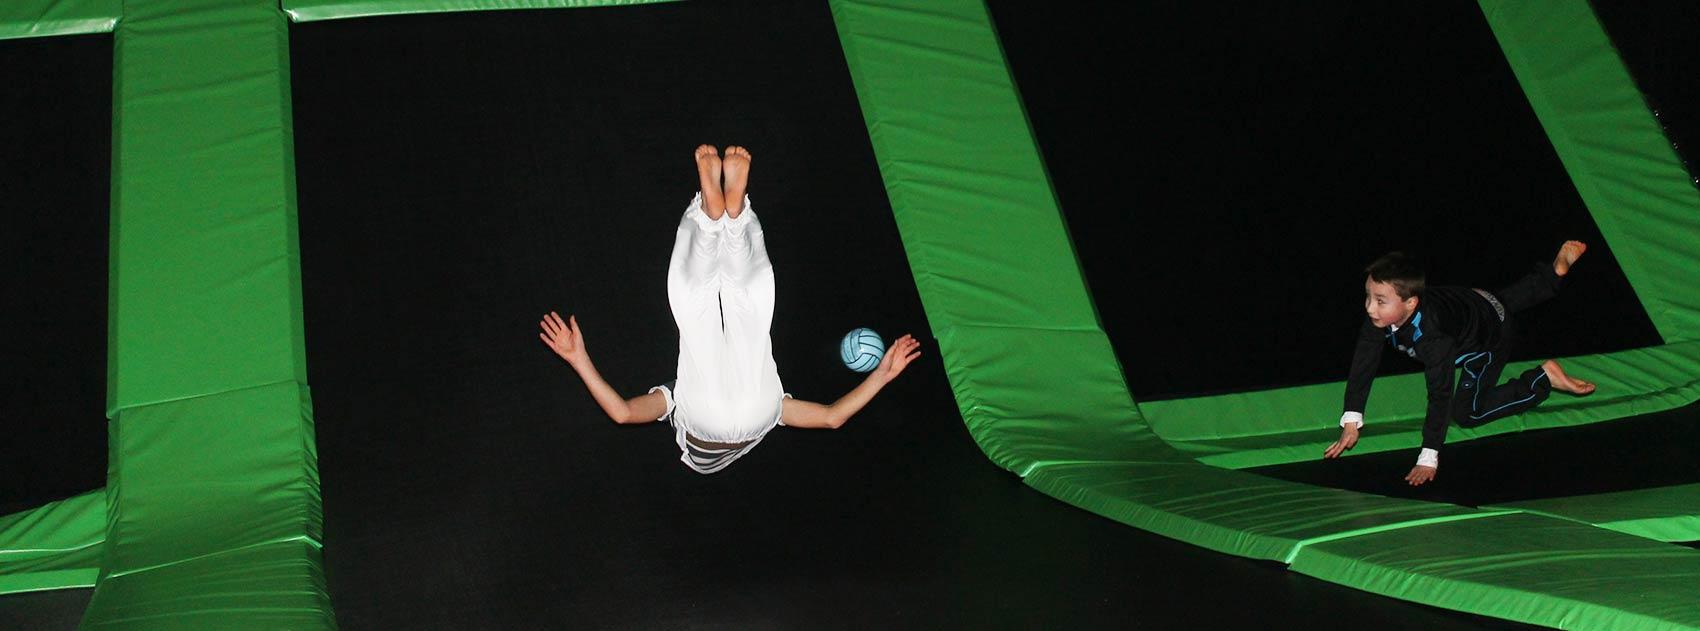 trampolines lannion city sport. Black Bedroom Furniture Sets. Home Design Ideas